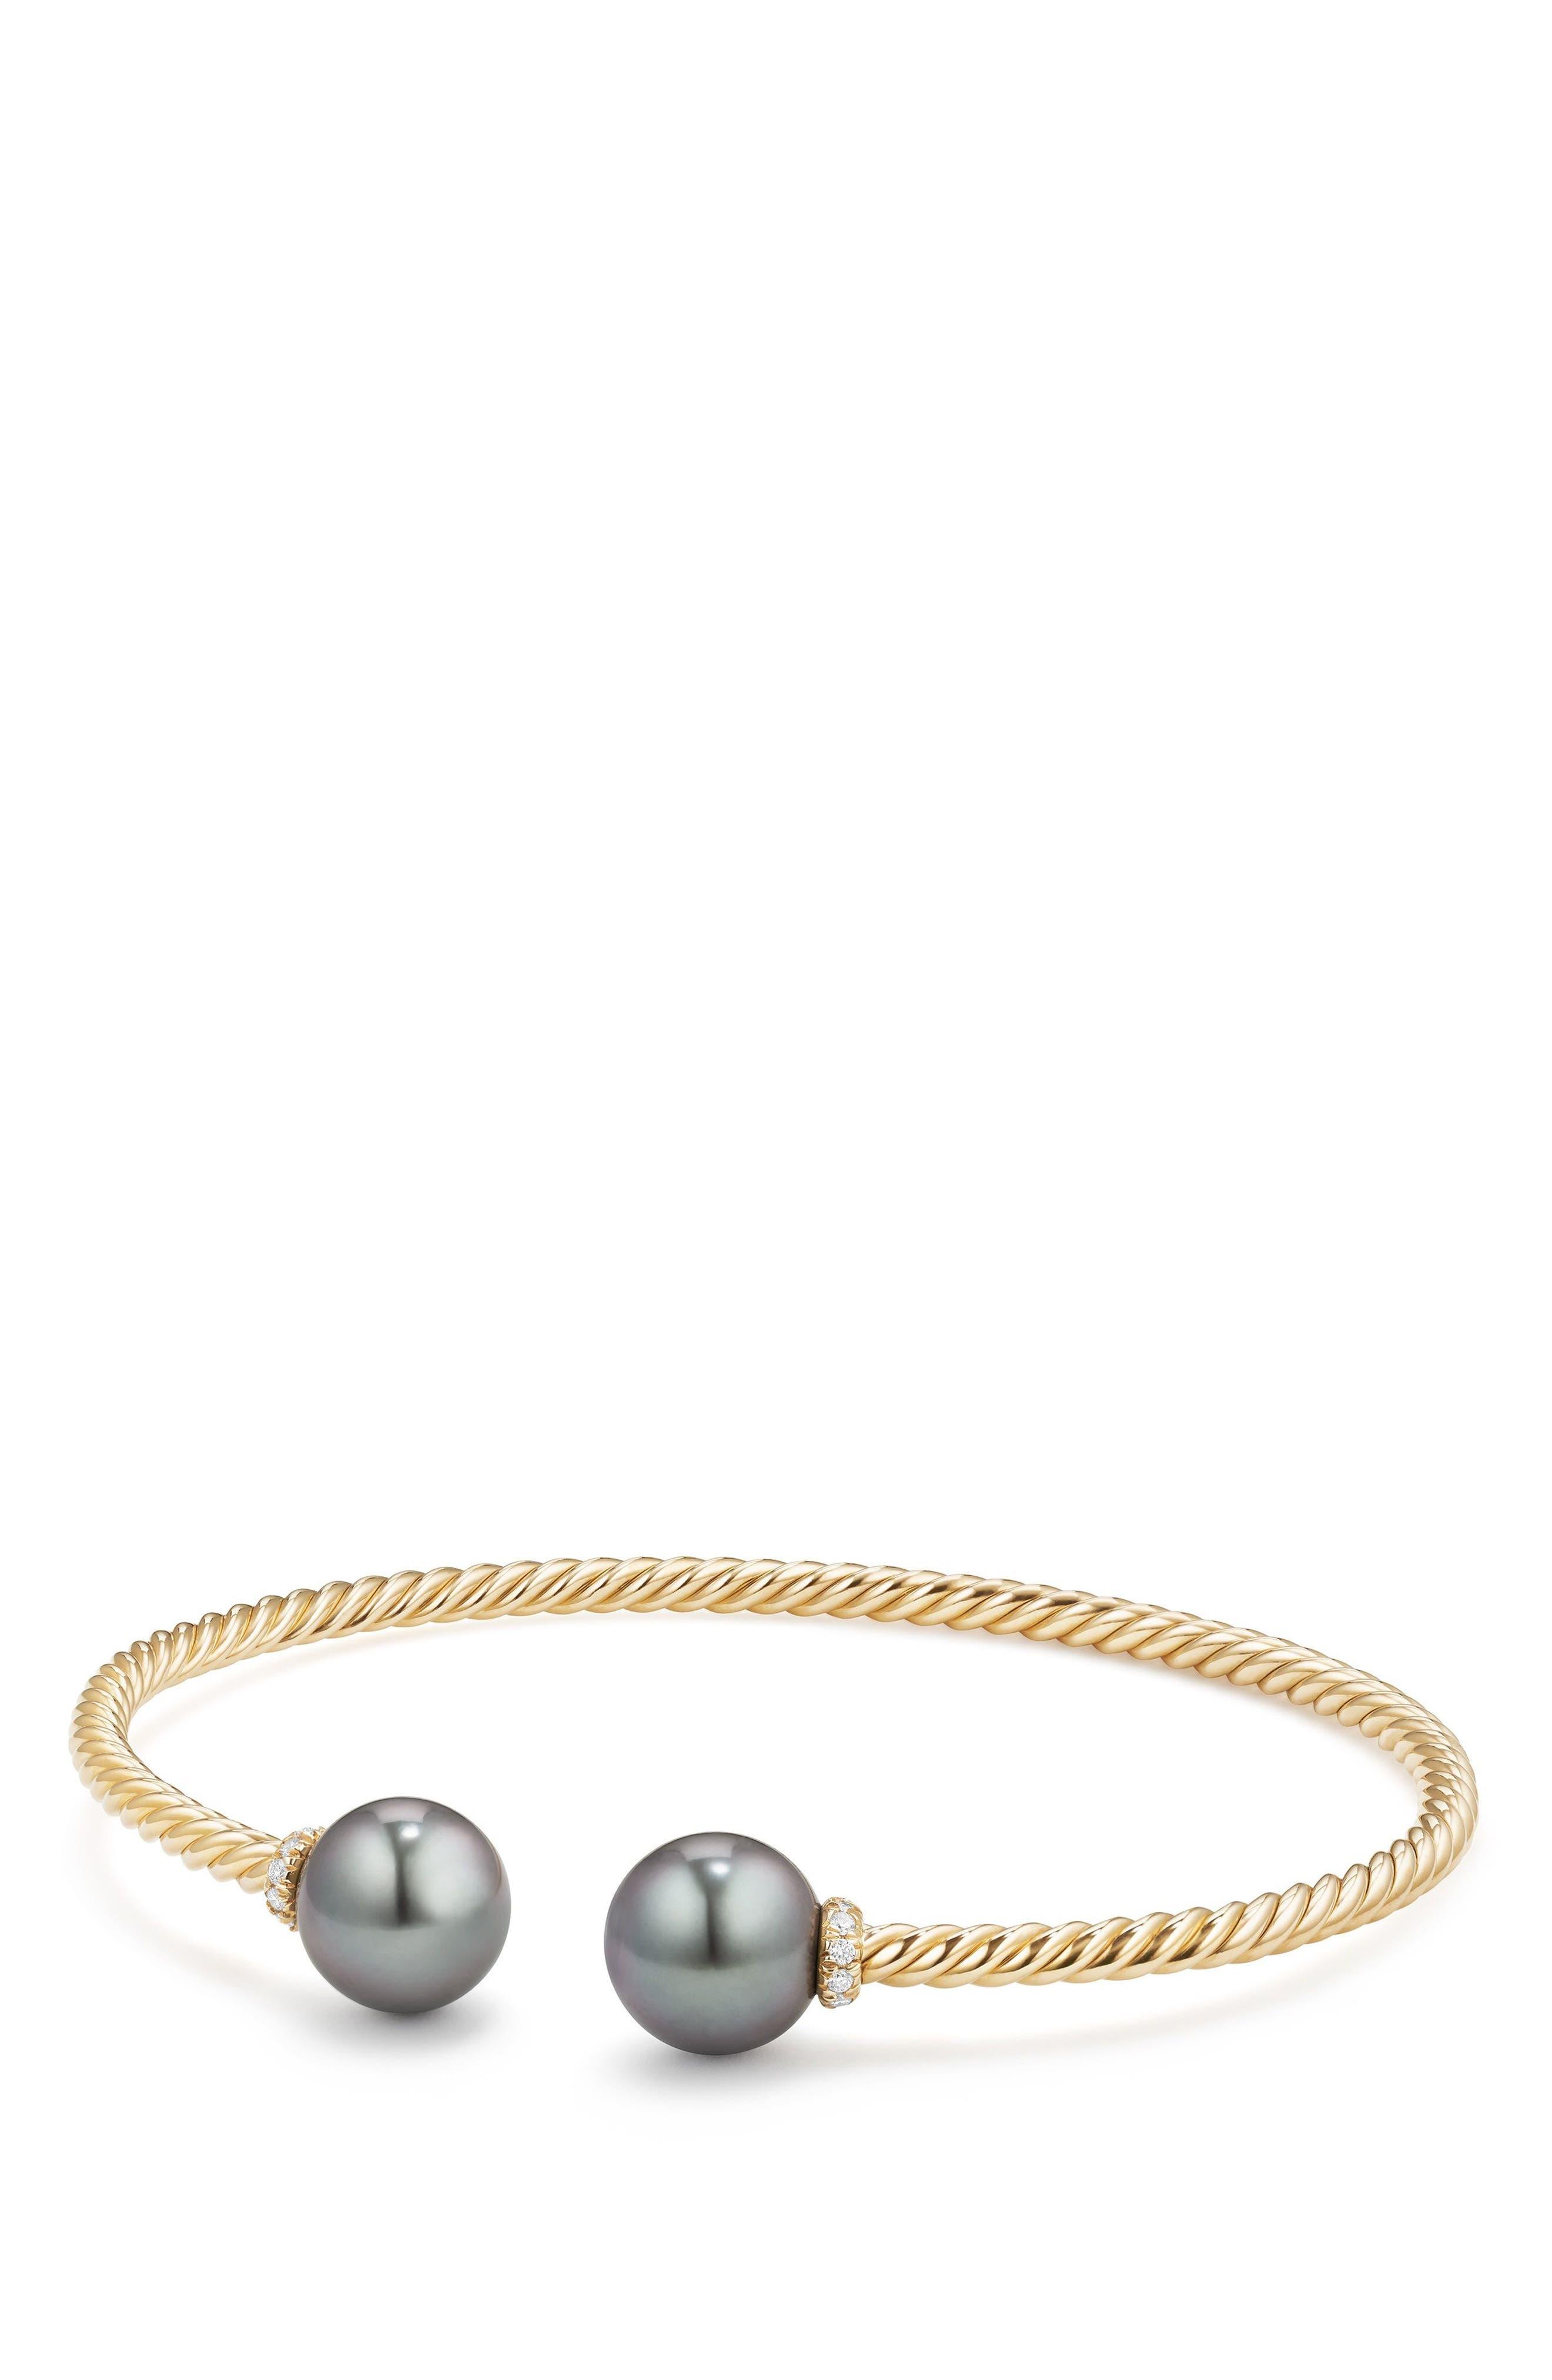 Solari Bead Bracelet with Diamonds,                         Main,                         color, Gold/ Diamond/ Grey Pearl